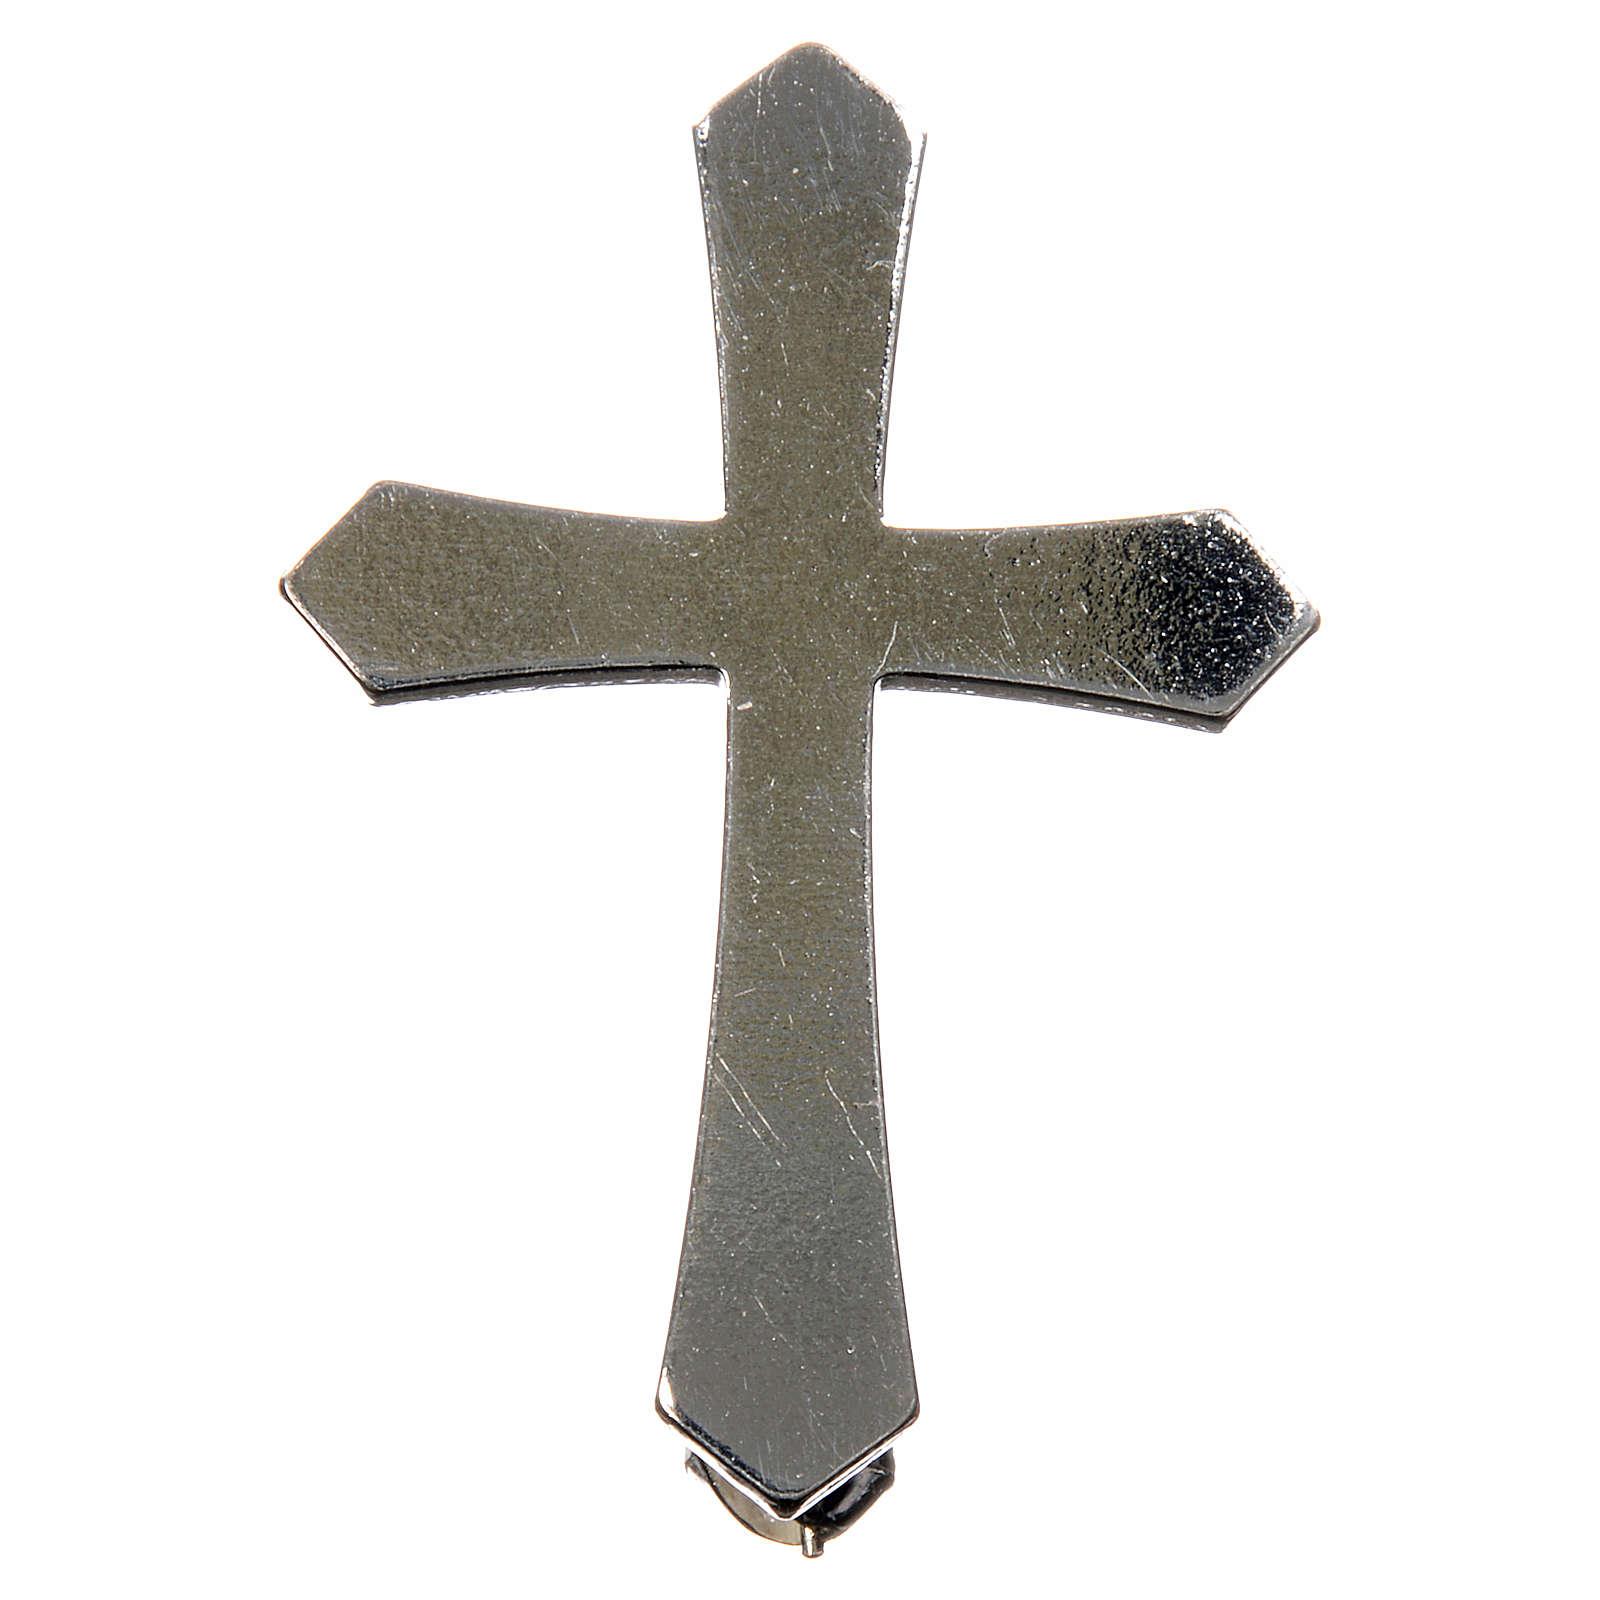 Clergyman krzyż srebro 925 4